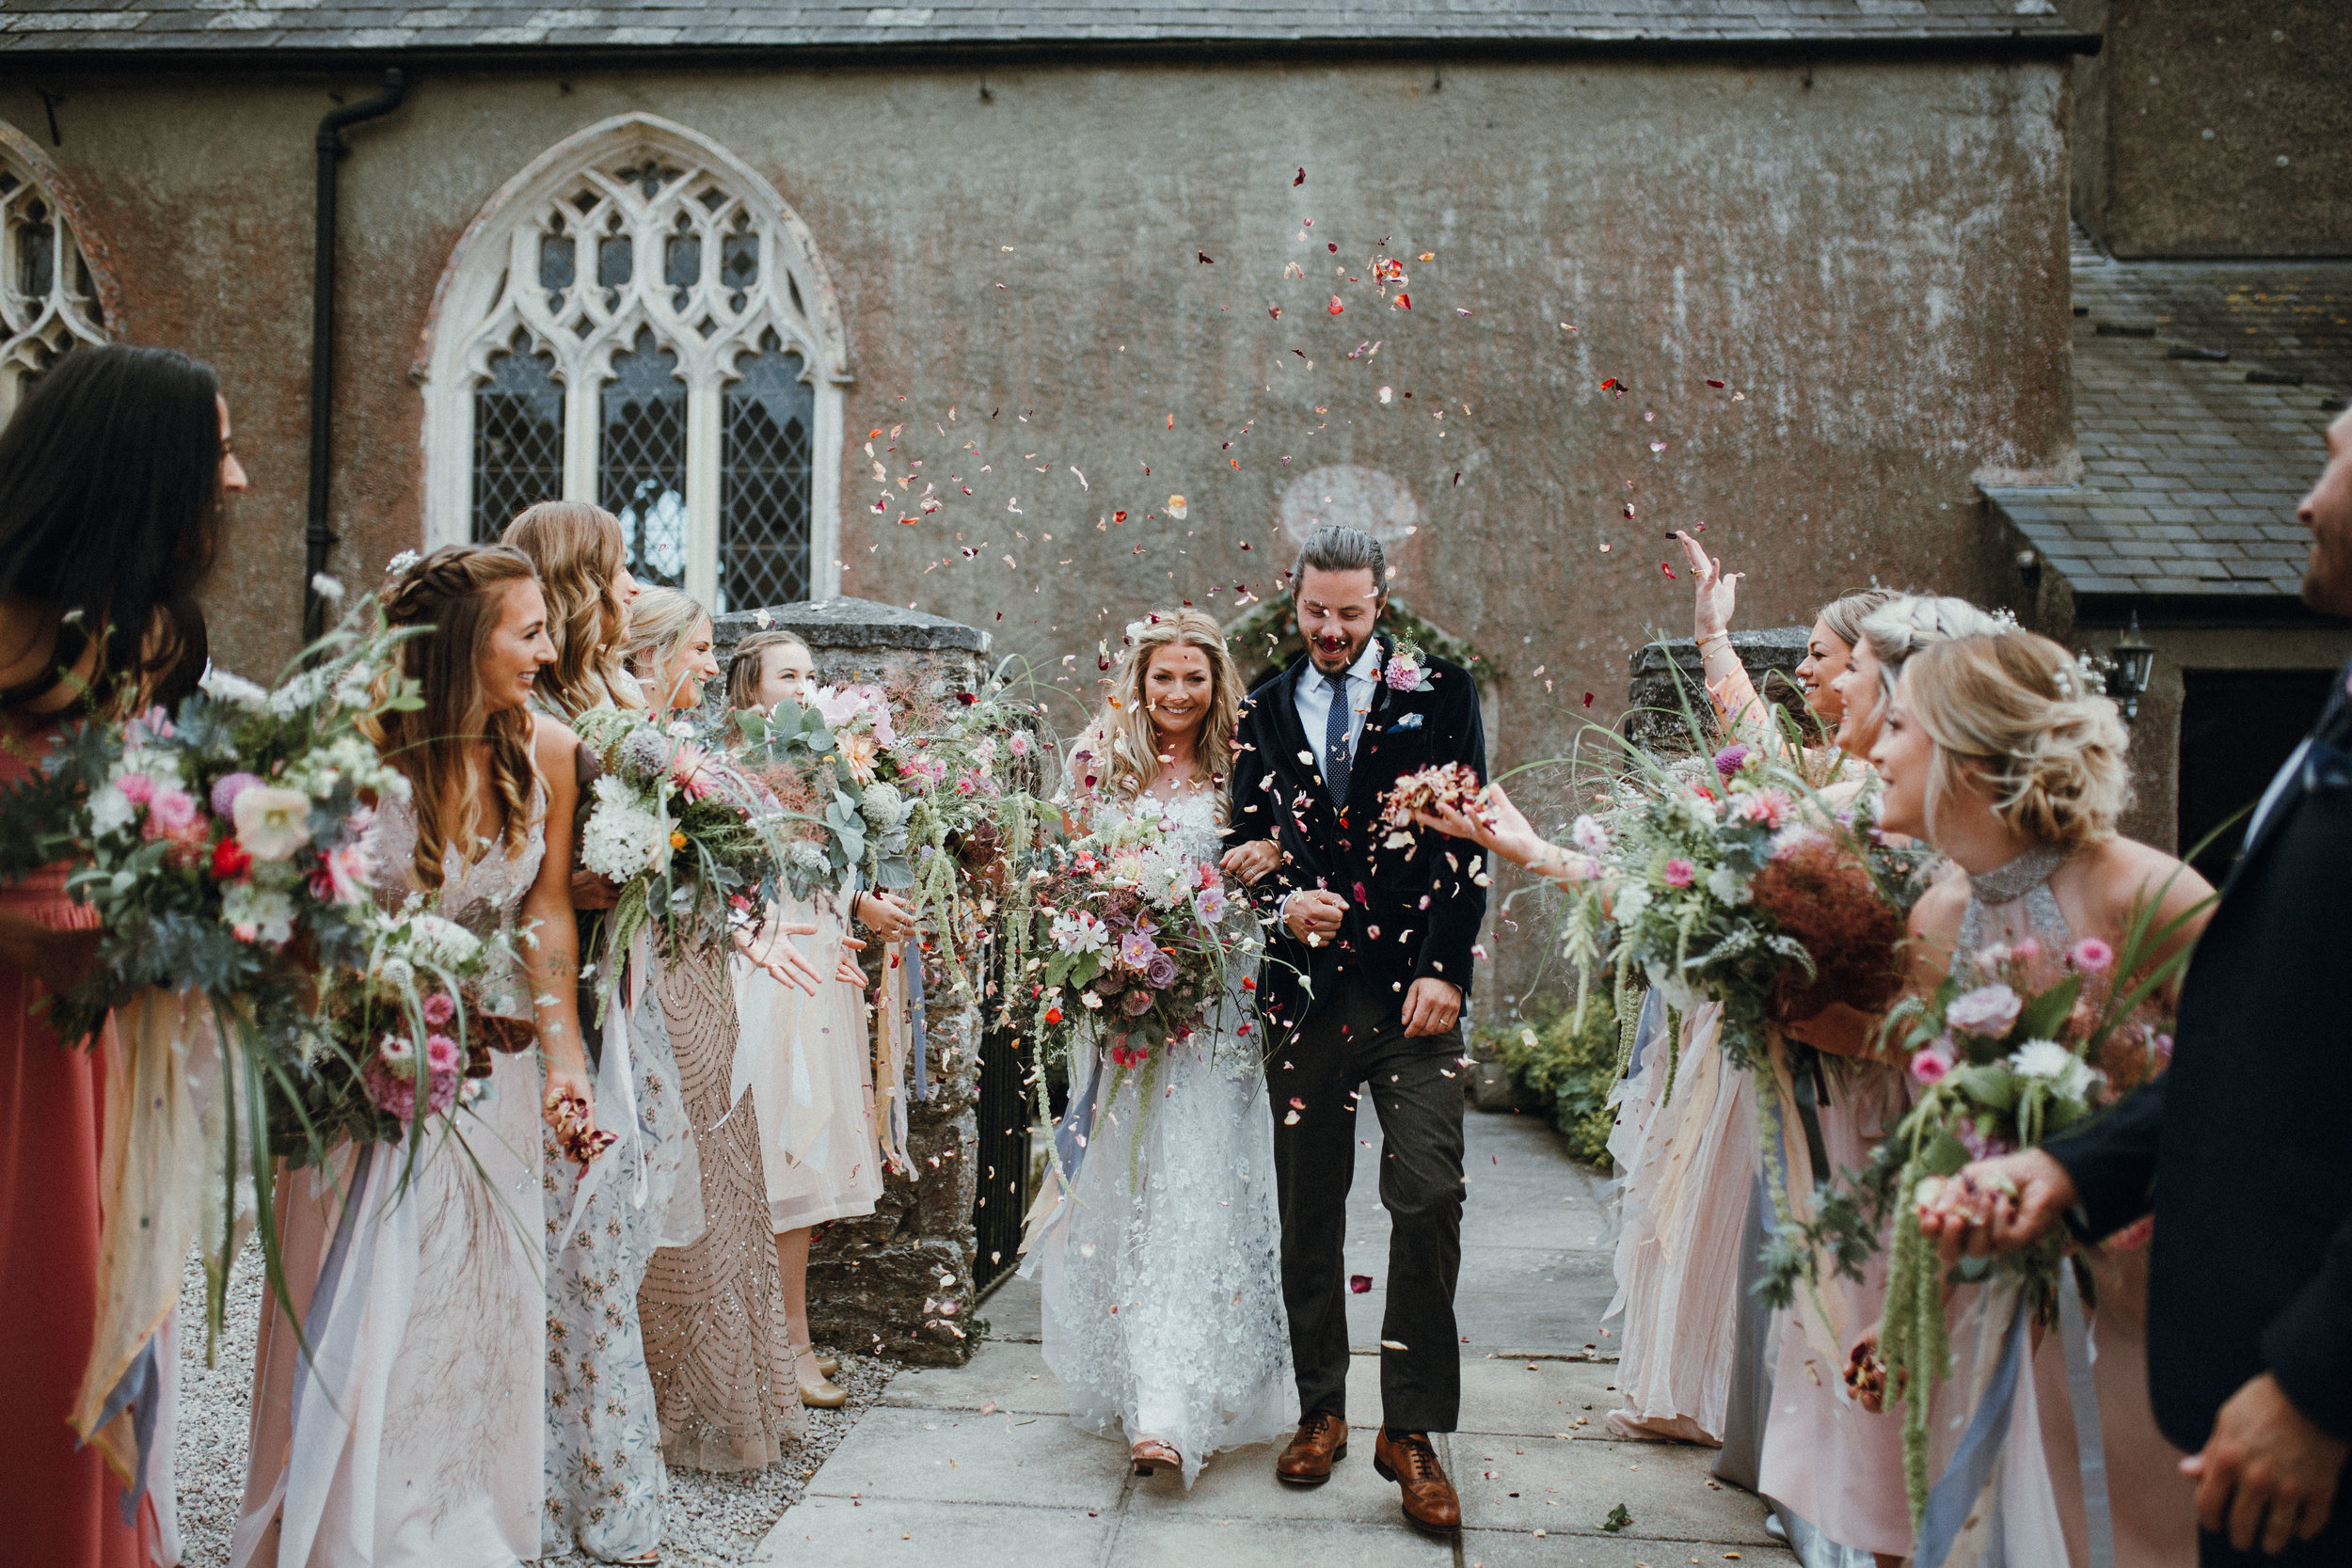 Wedding couple walking through confetti